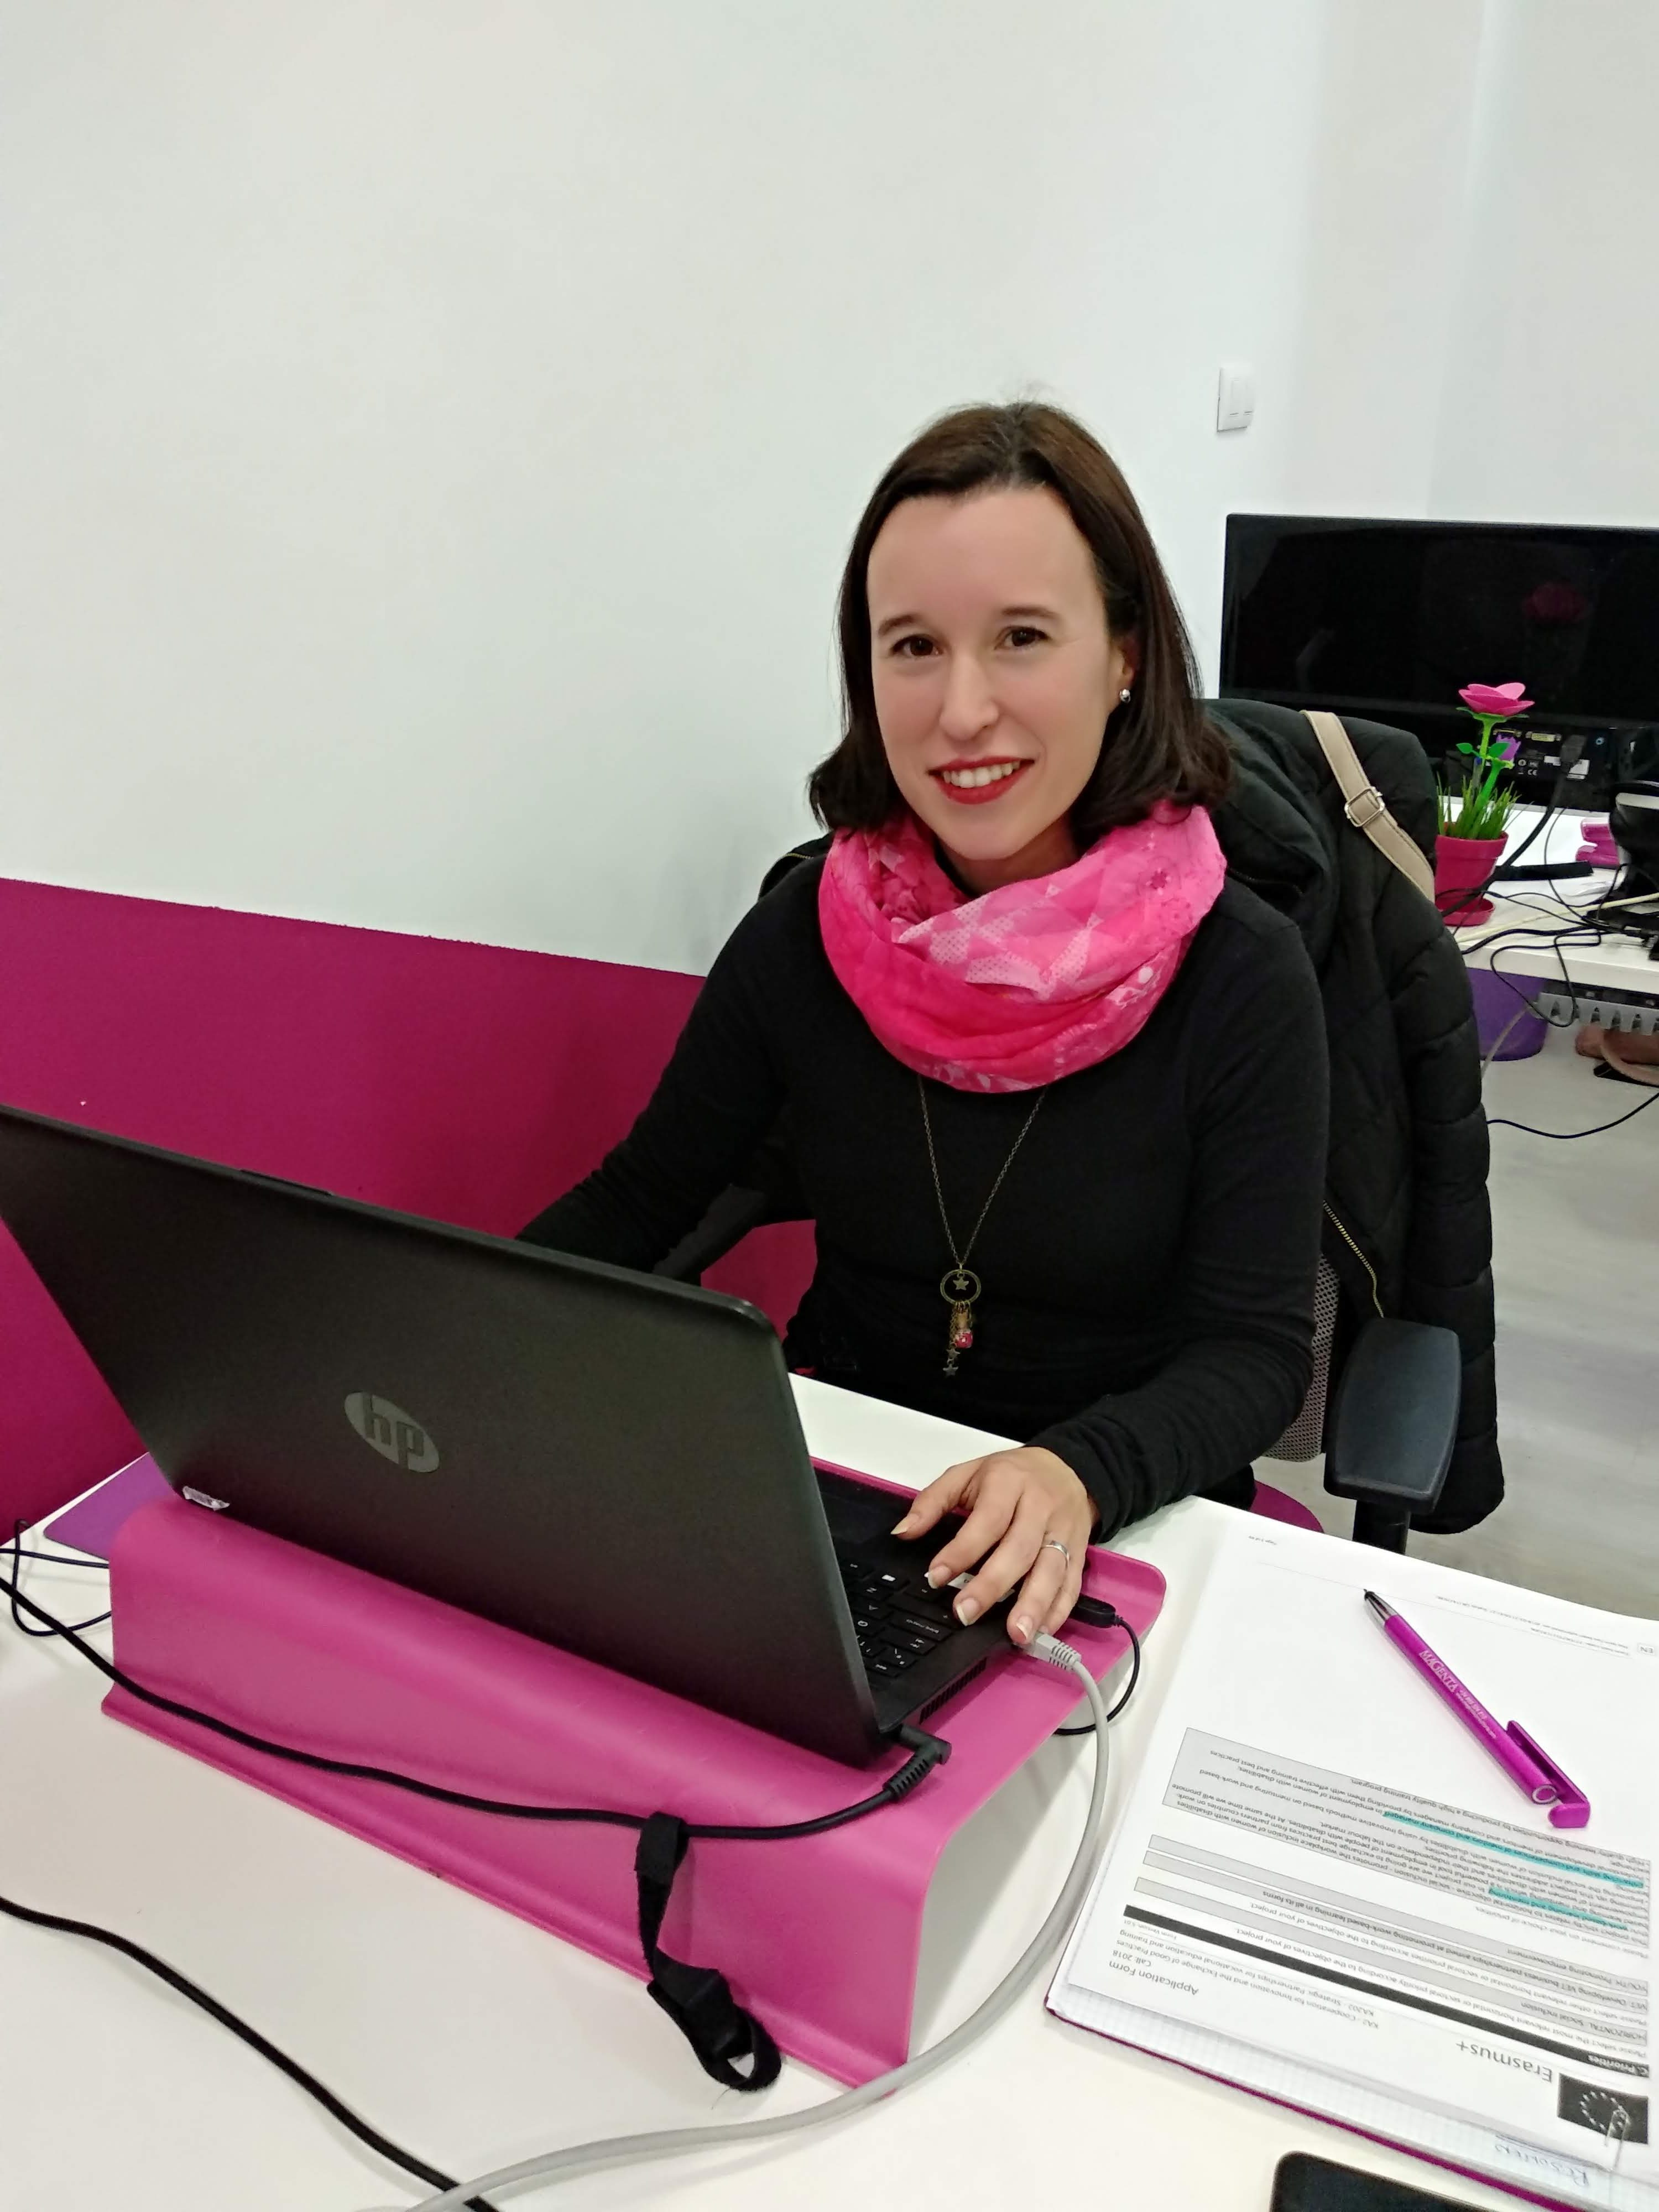 Silvia González-Cutre Alfaro